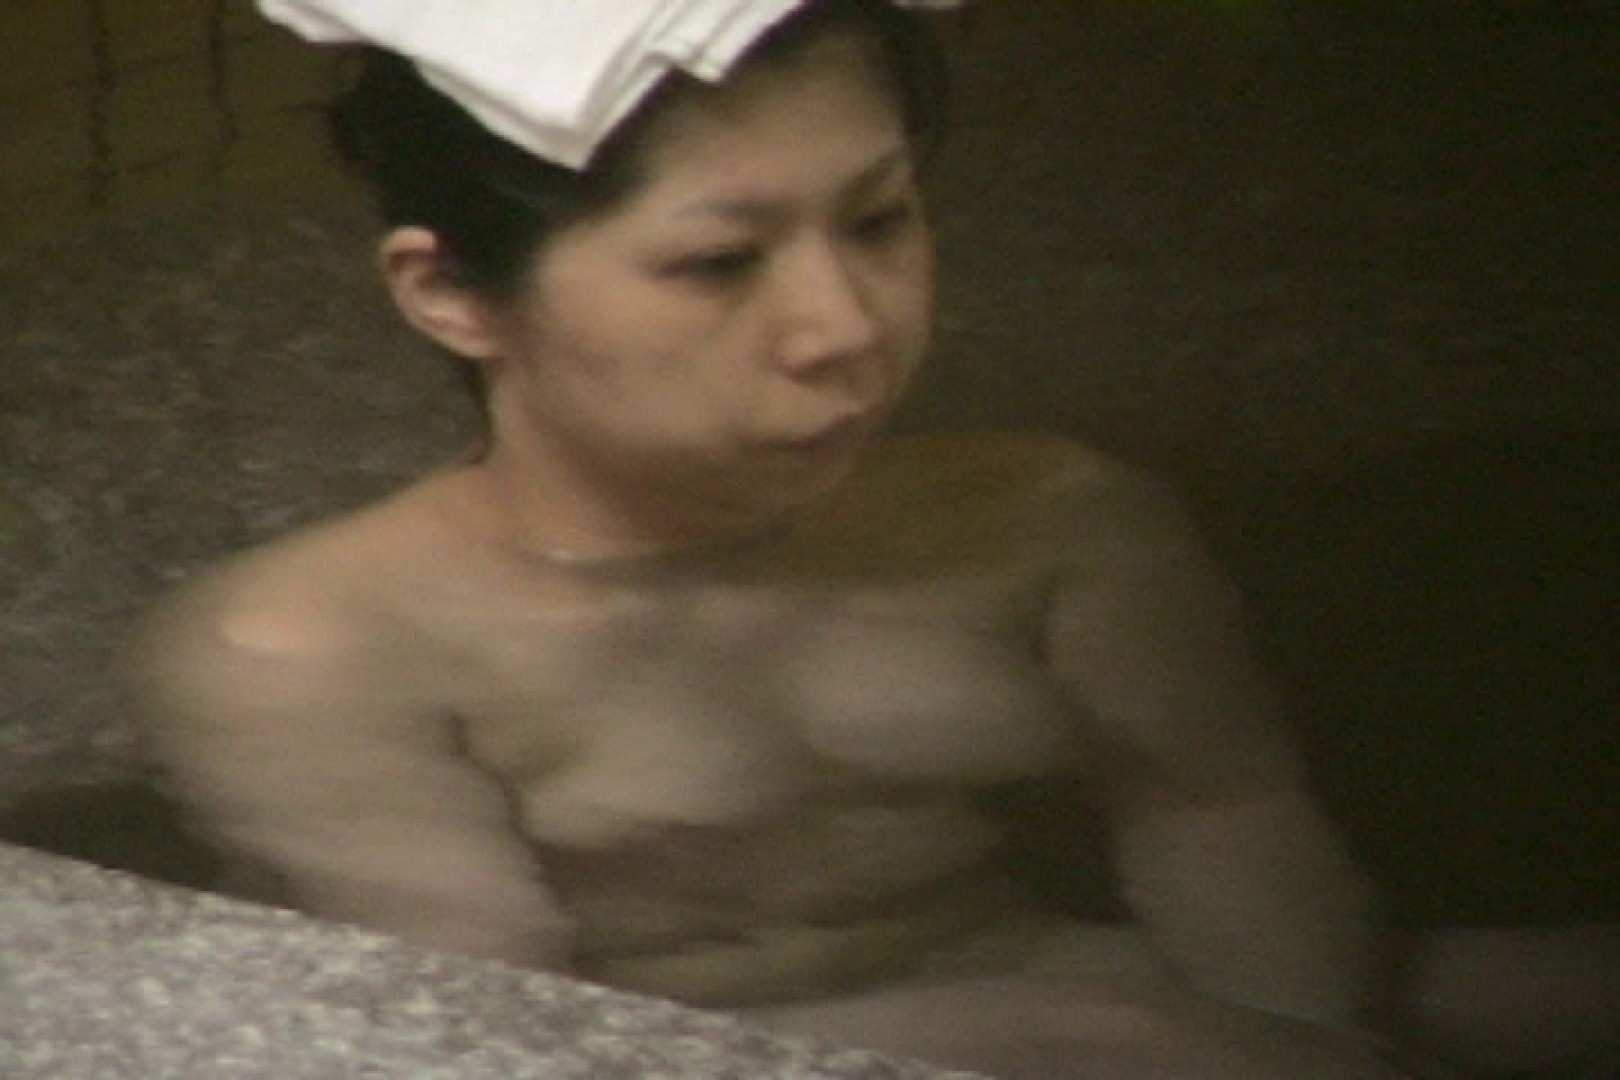 Aquaな露天風呂Vol.456 盗撮 | HなOL  102pic 56